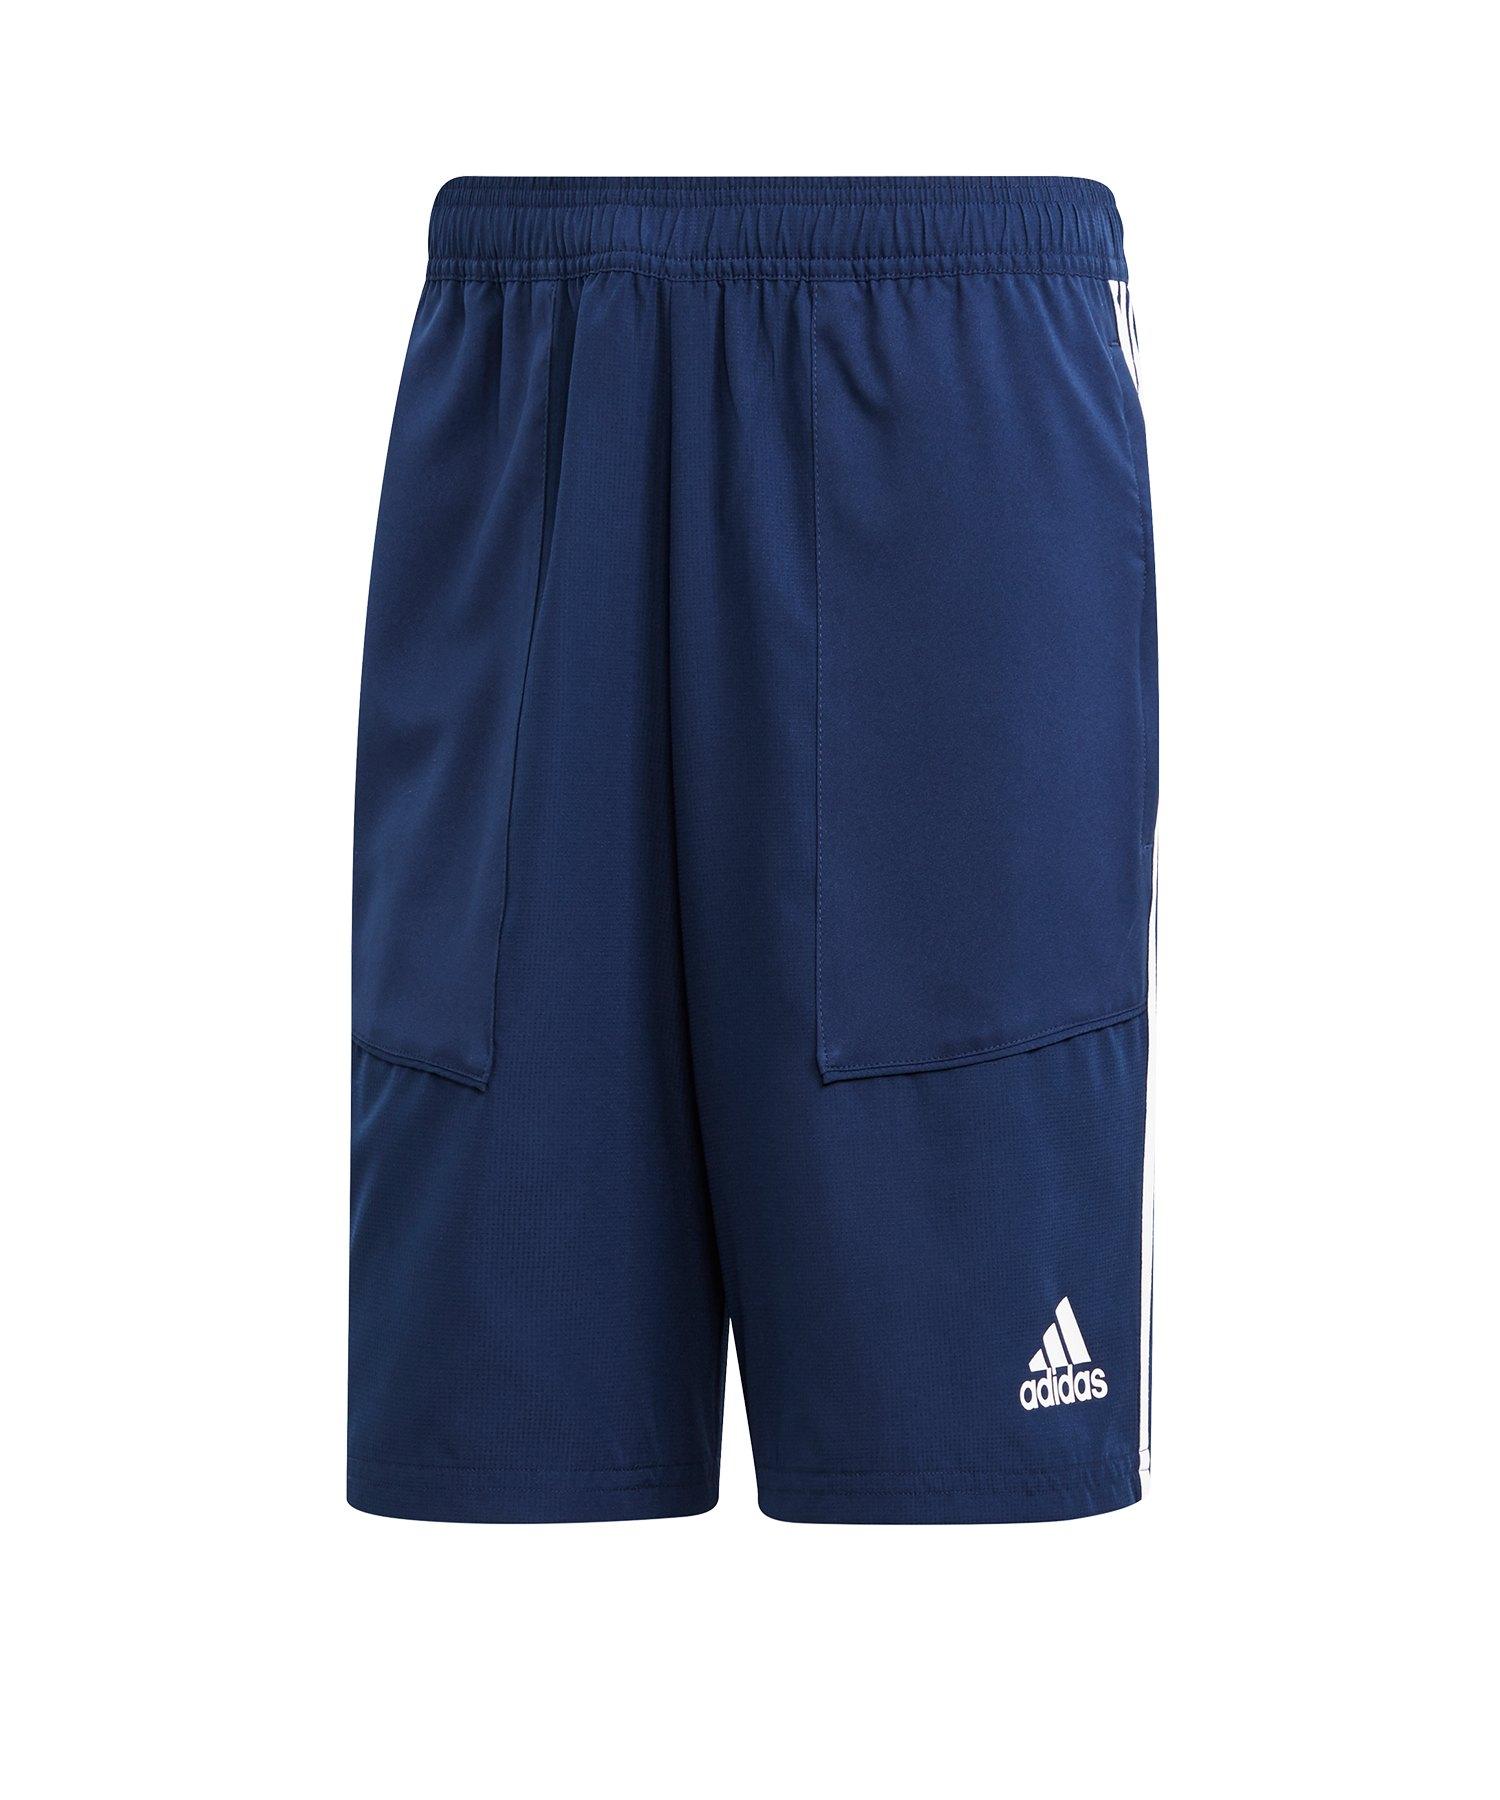 adidas Tiro 19 Woven Short Dunkelblau Weiss - blau